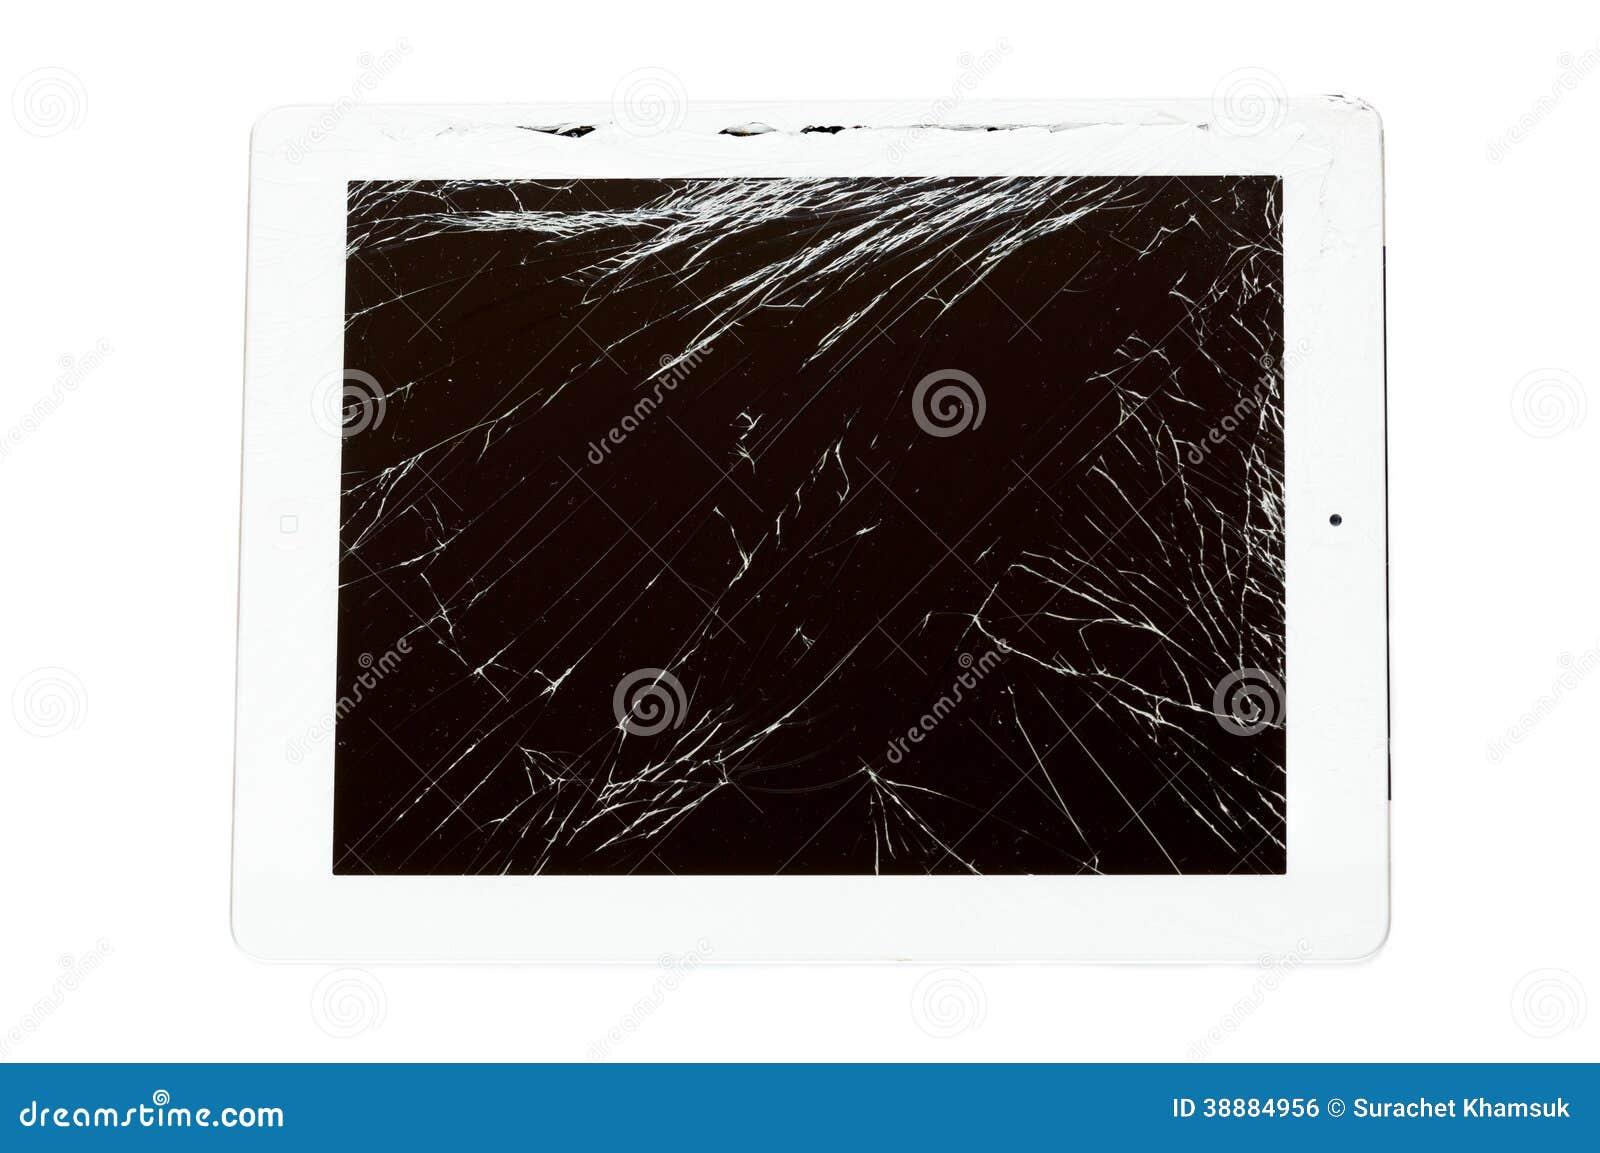 Pastylka komputer z łamanym szkło ekranem